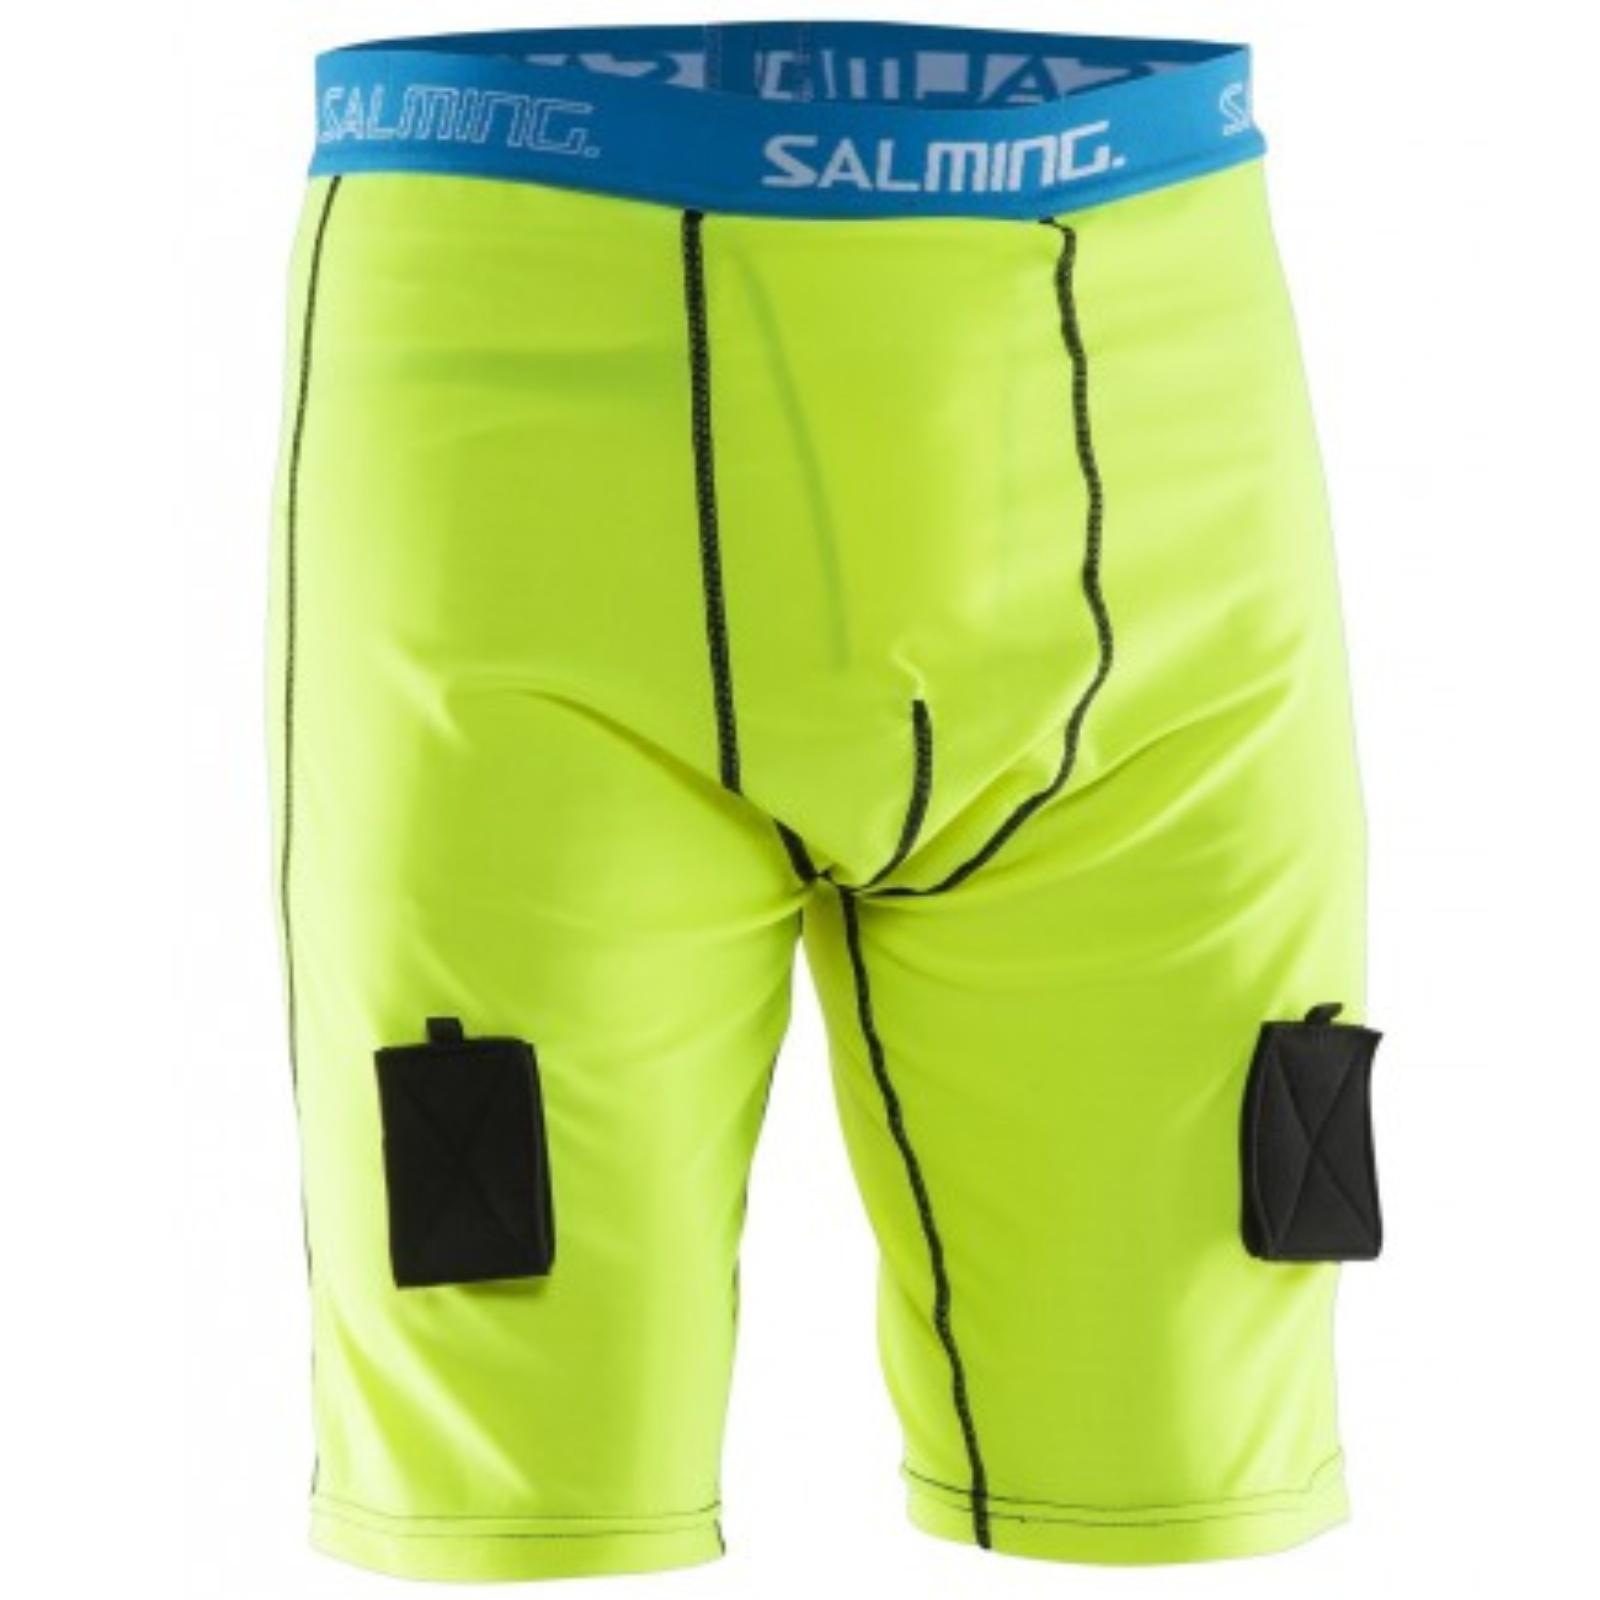 Hokejové šortky SALMING Comp Jock Short Pant vel. 140